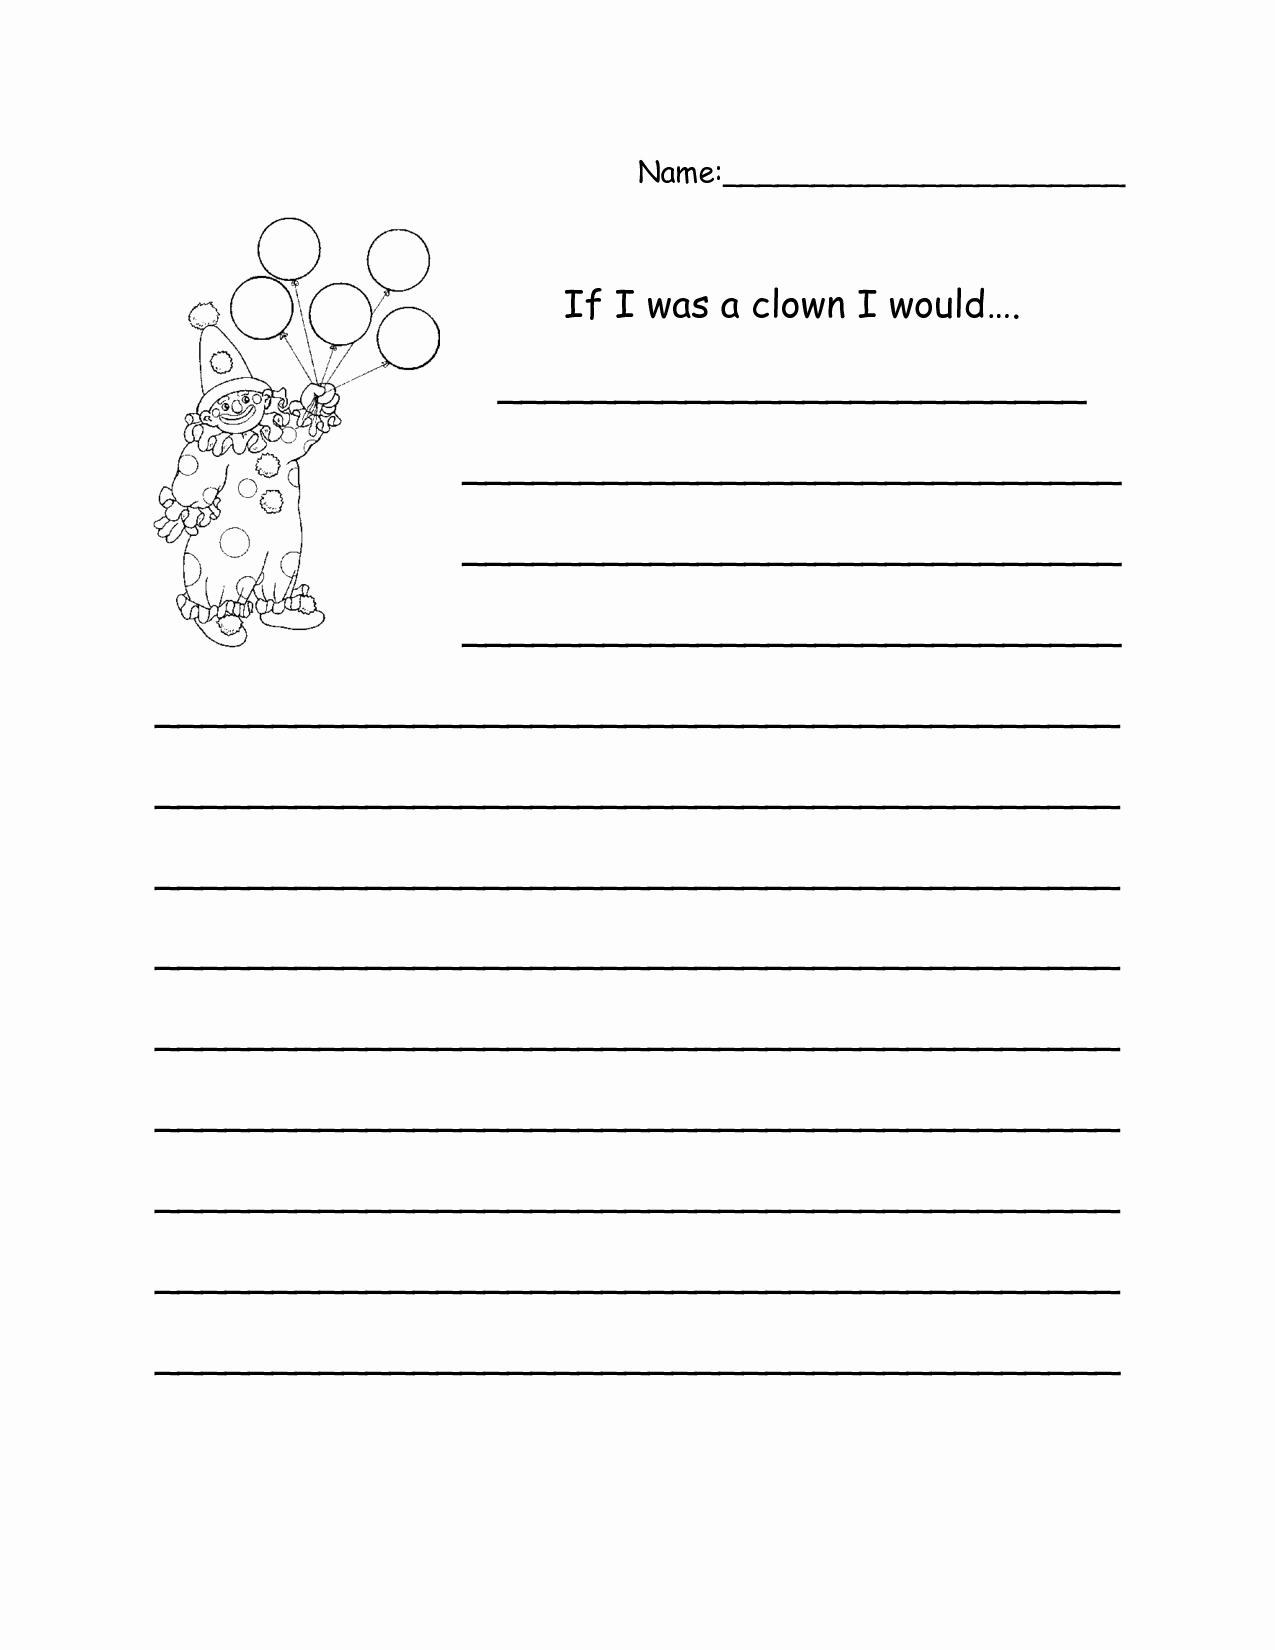 Third Grade Writing Worksheet Beautiful Third Grade Writing Prompts Mon Core Other Rank